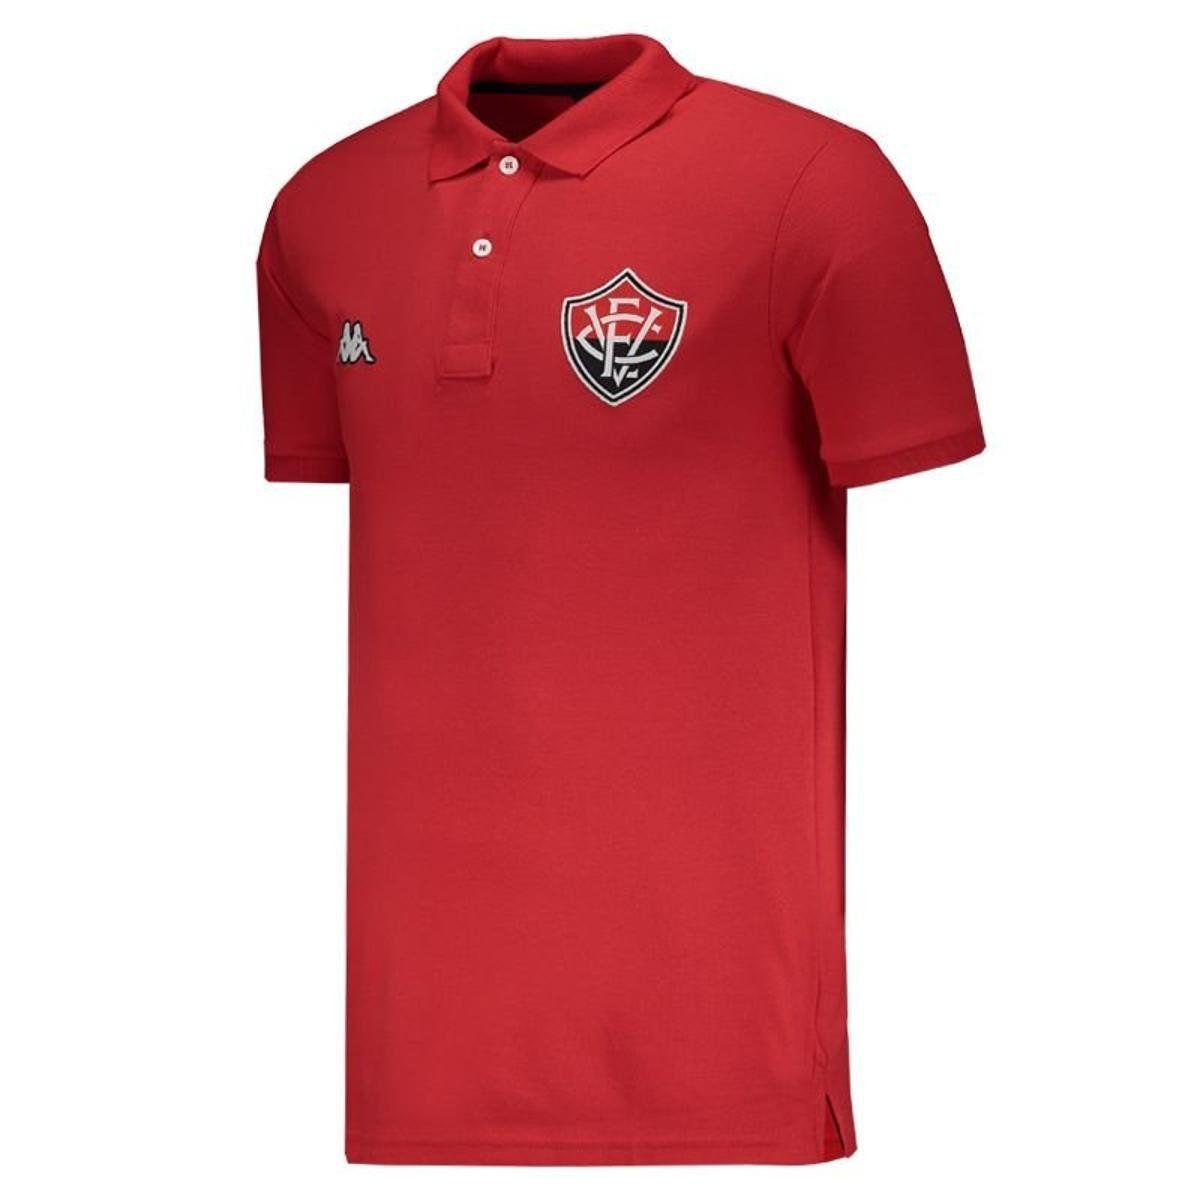 Camisa Polo Viagem Atleta - Kappa - 2019 - Masculina - Vermelho